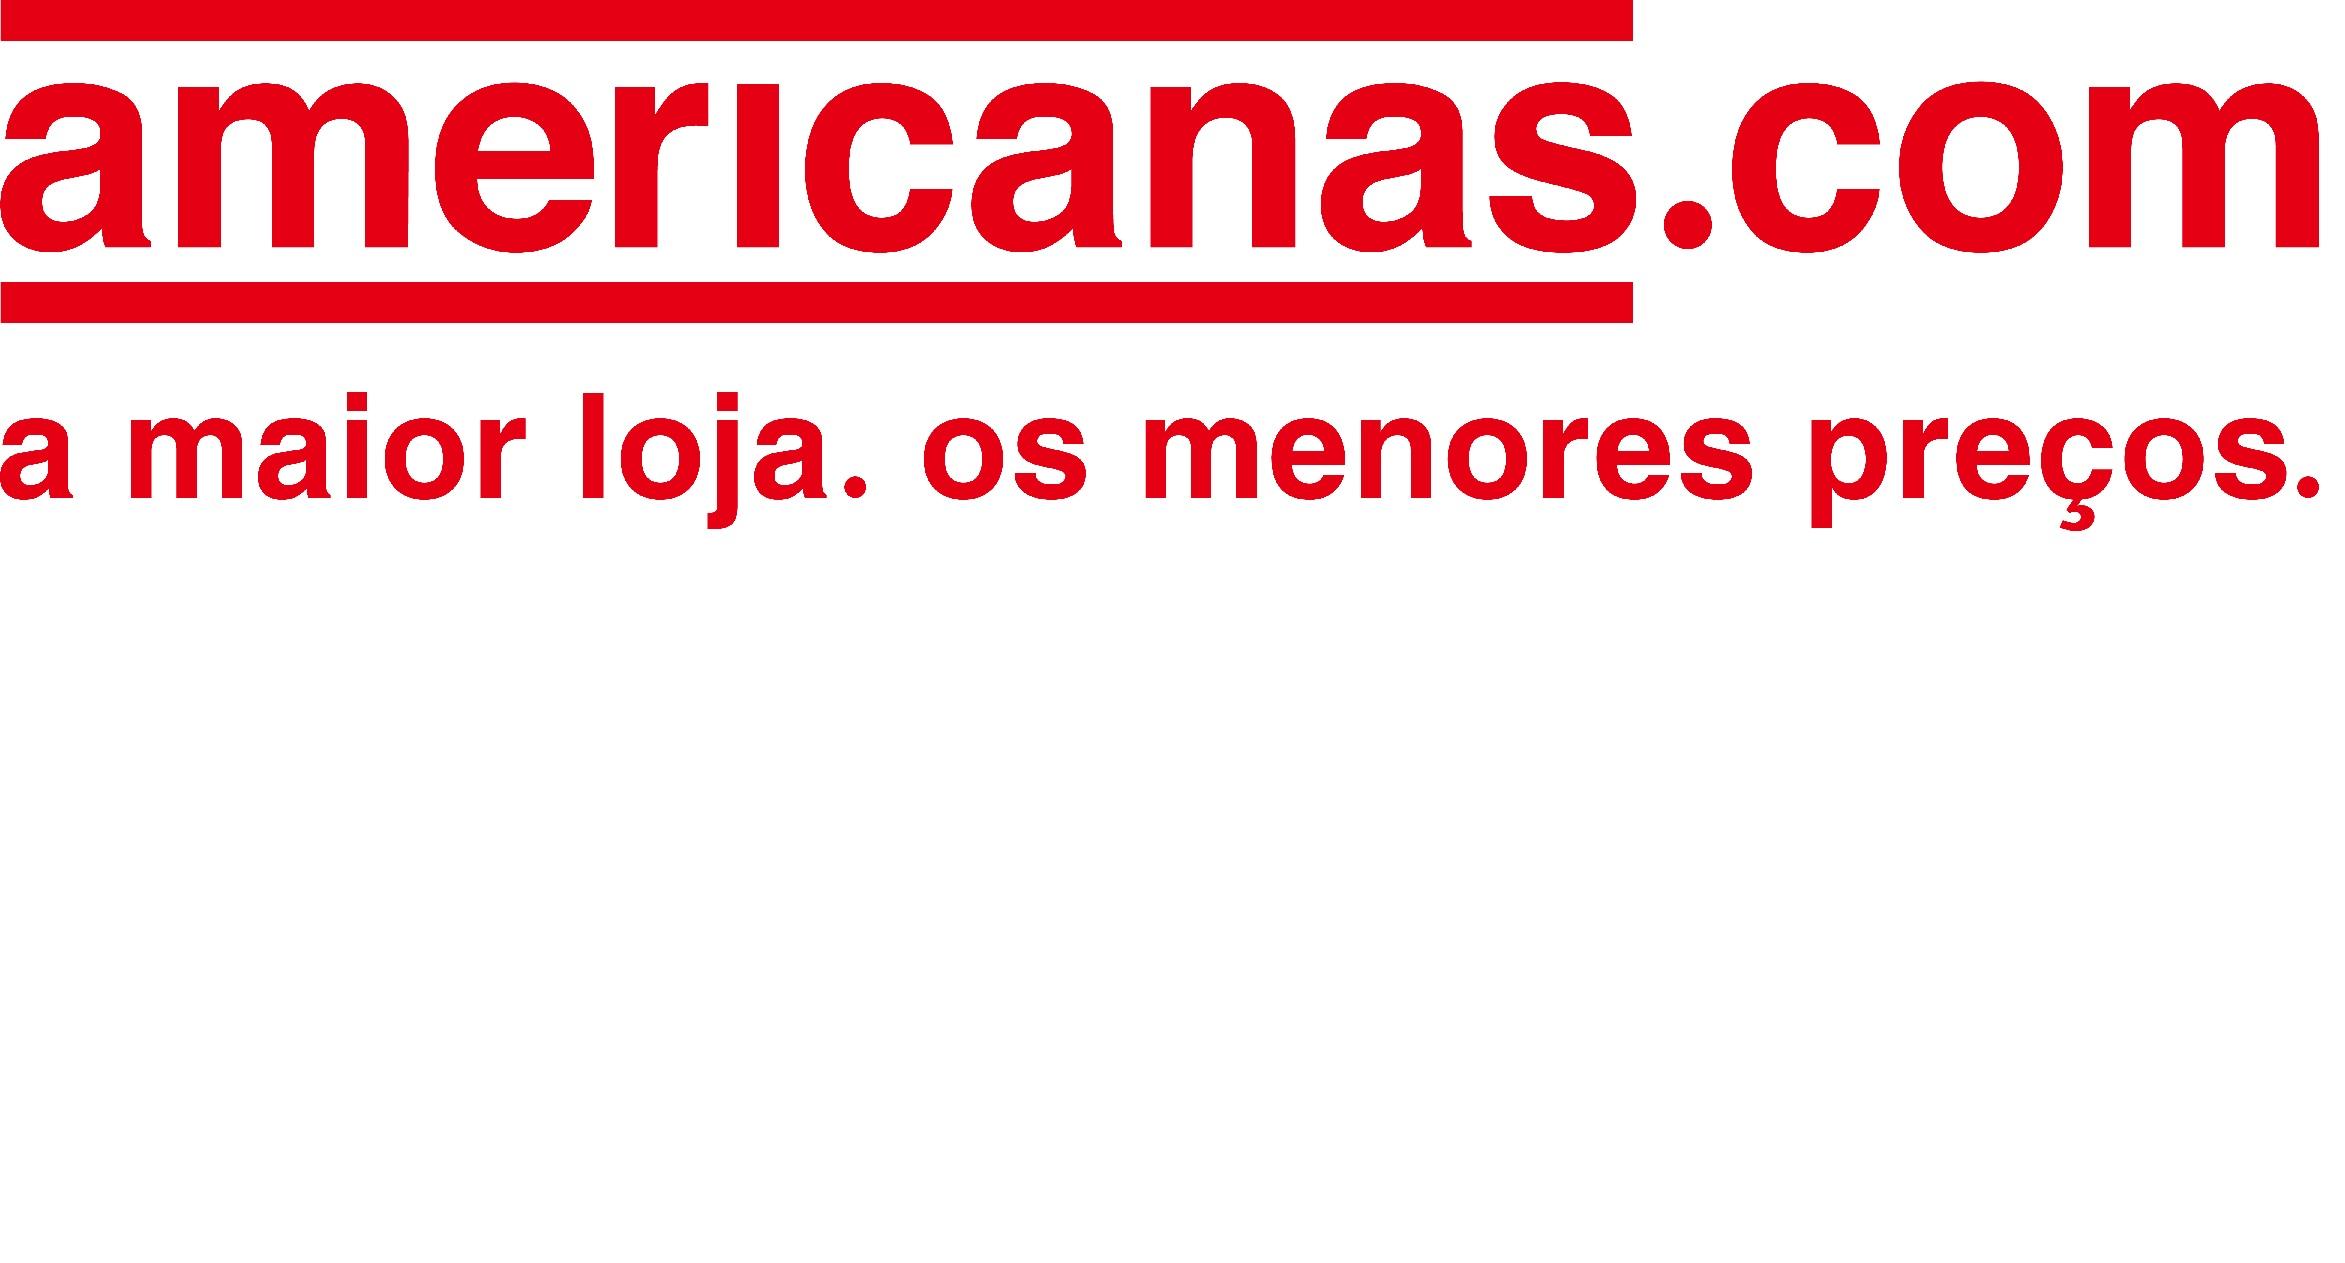 americanas_1418932840.03.jpg